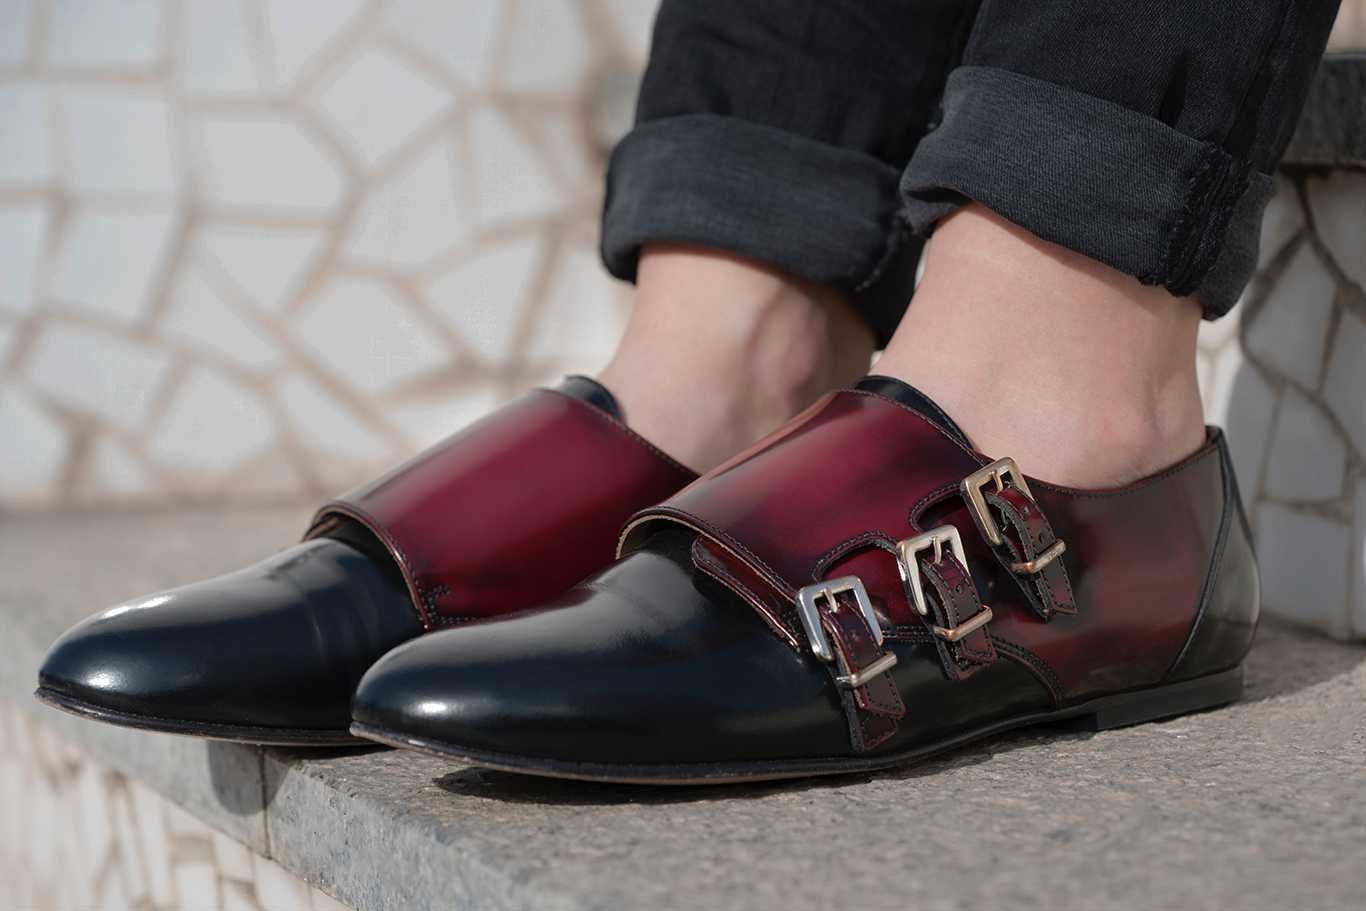 Zapatos MyBlüchers Monks con tres hebillas